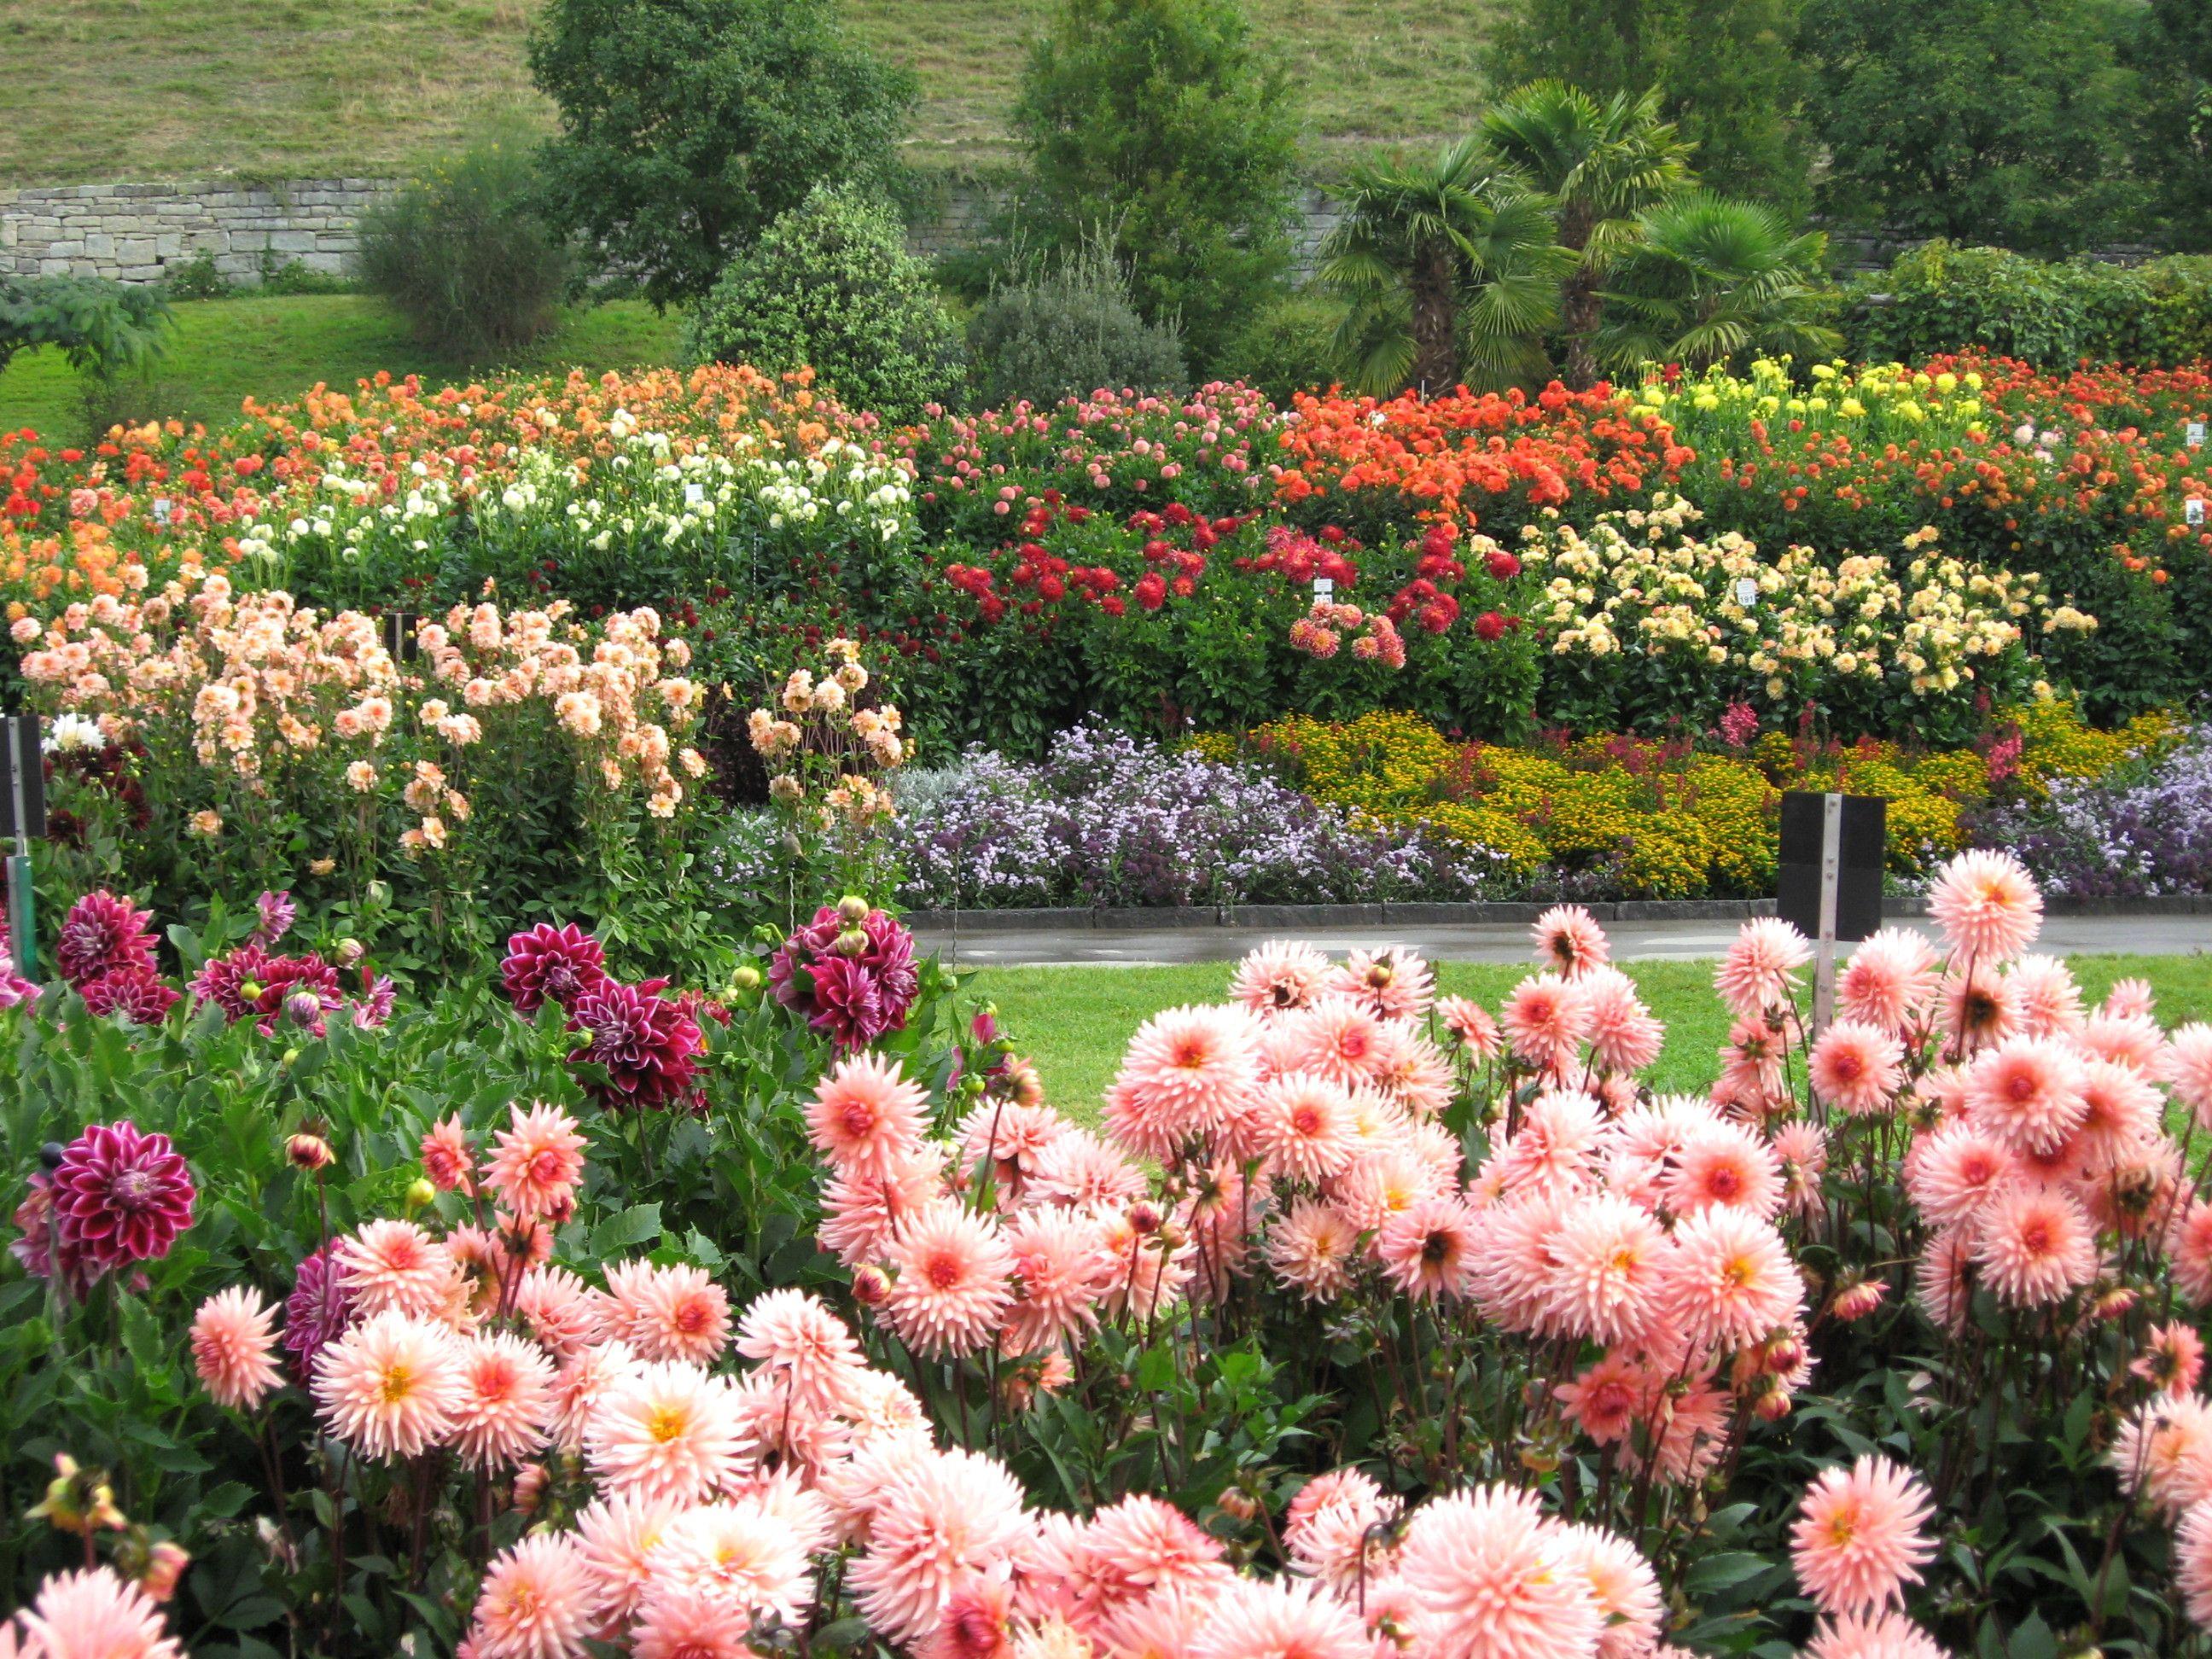 Dahlienblute Hauptblute Jetzt Floral Wreath Island Vacation